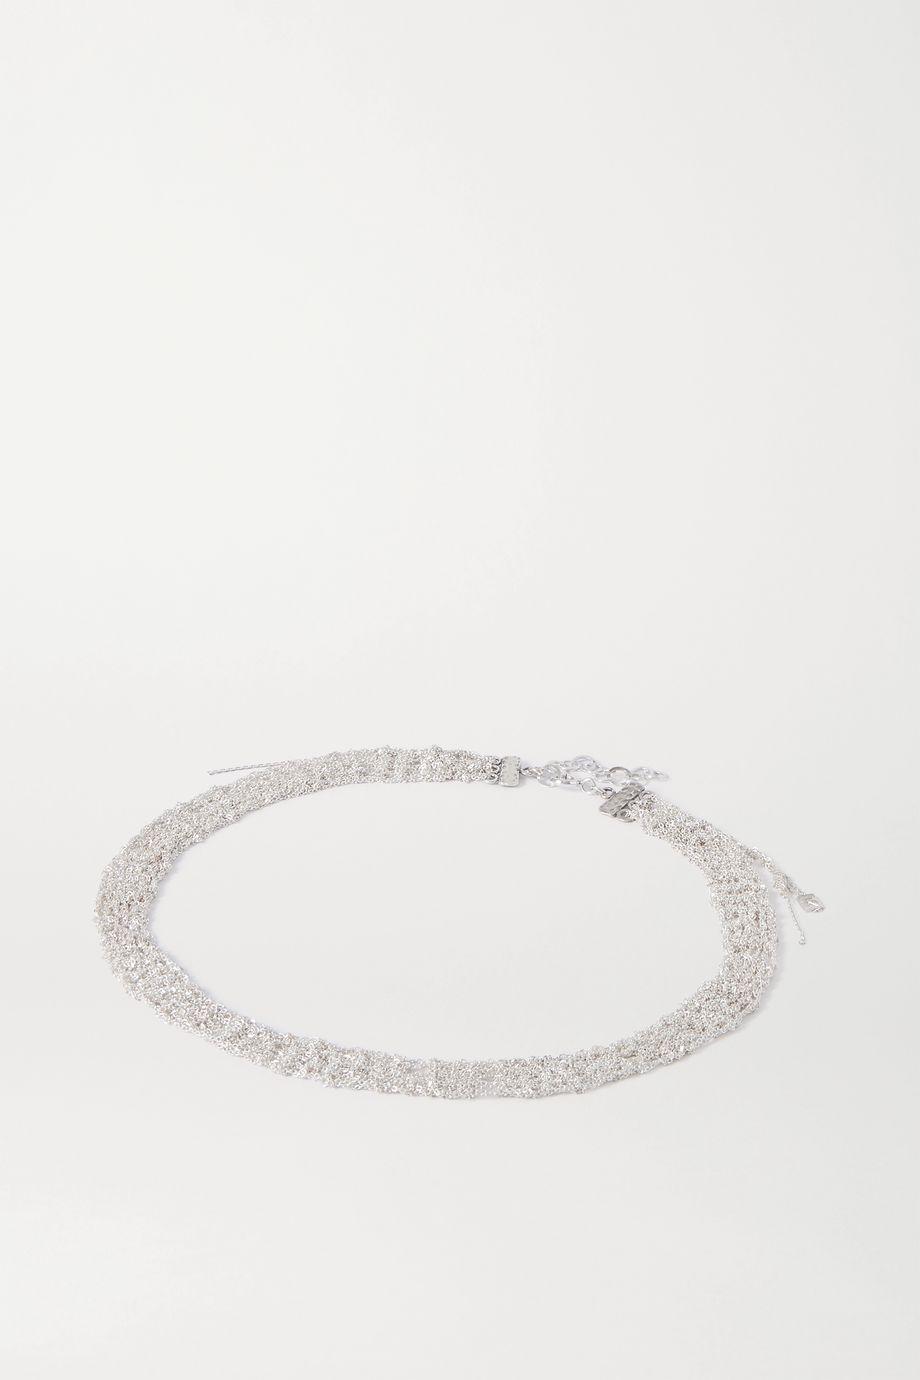 Katia Alpha Crocheted silver choker